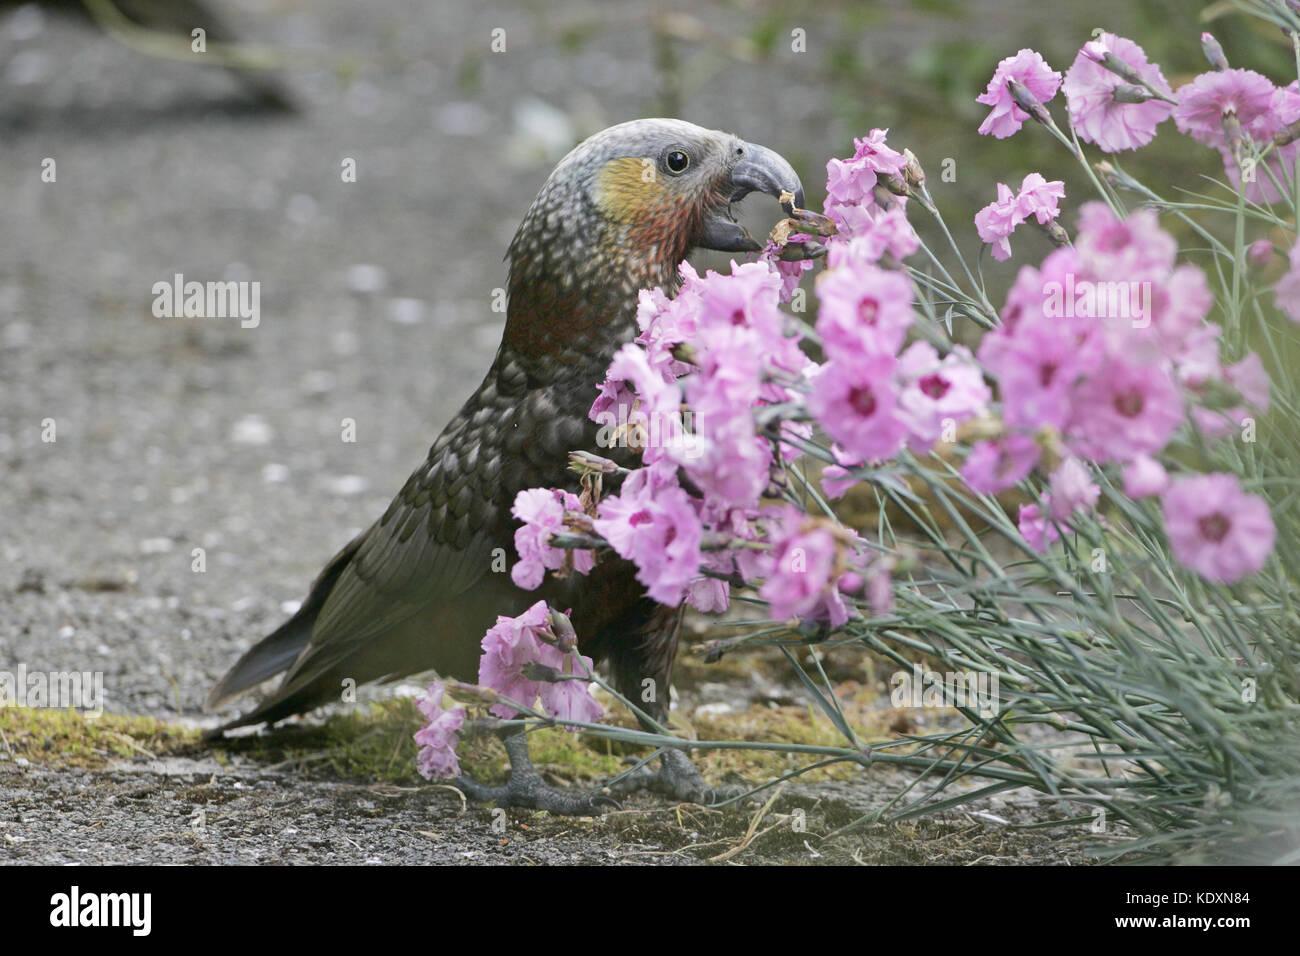 Kaka Nestor meridionalis an endemic parrot in garden eating flowers Stewart Island New Zealand - Stock Image